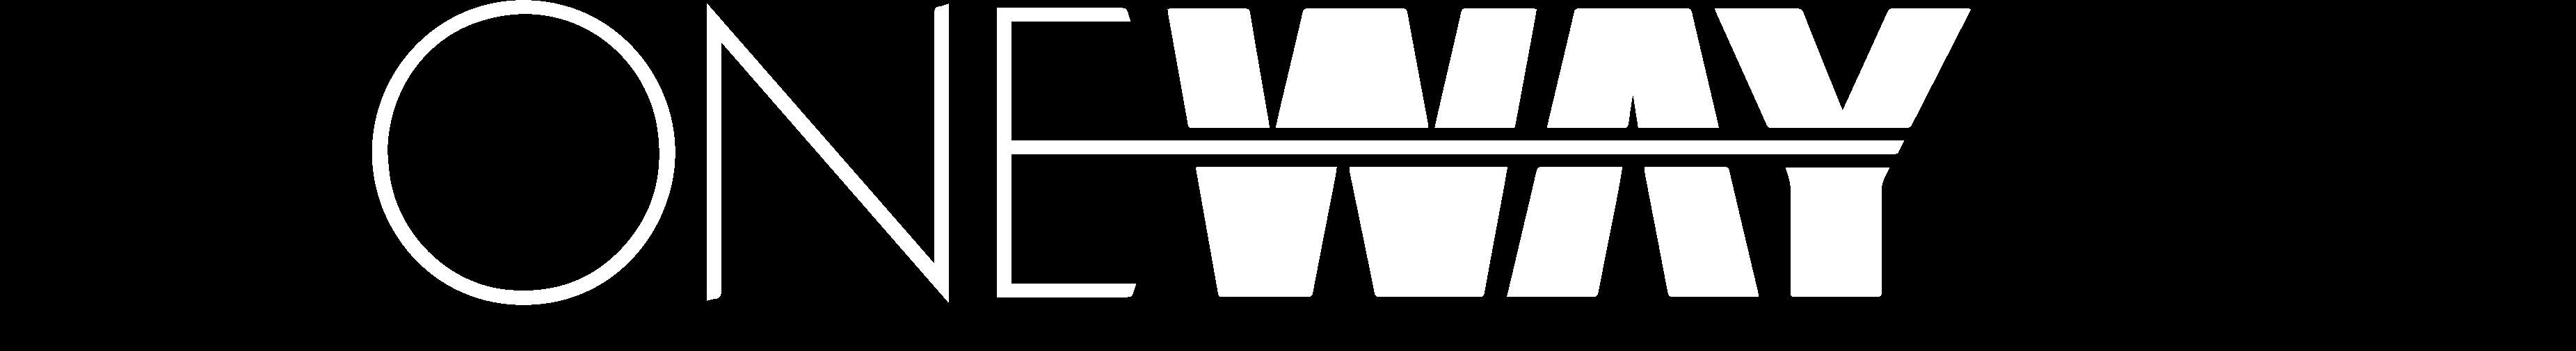 Oneway Media